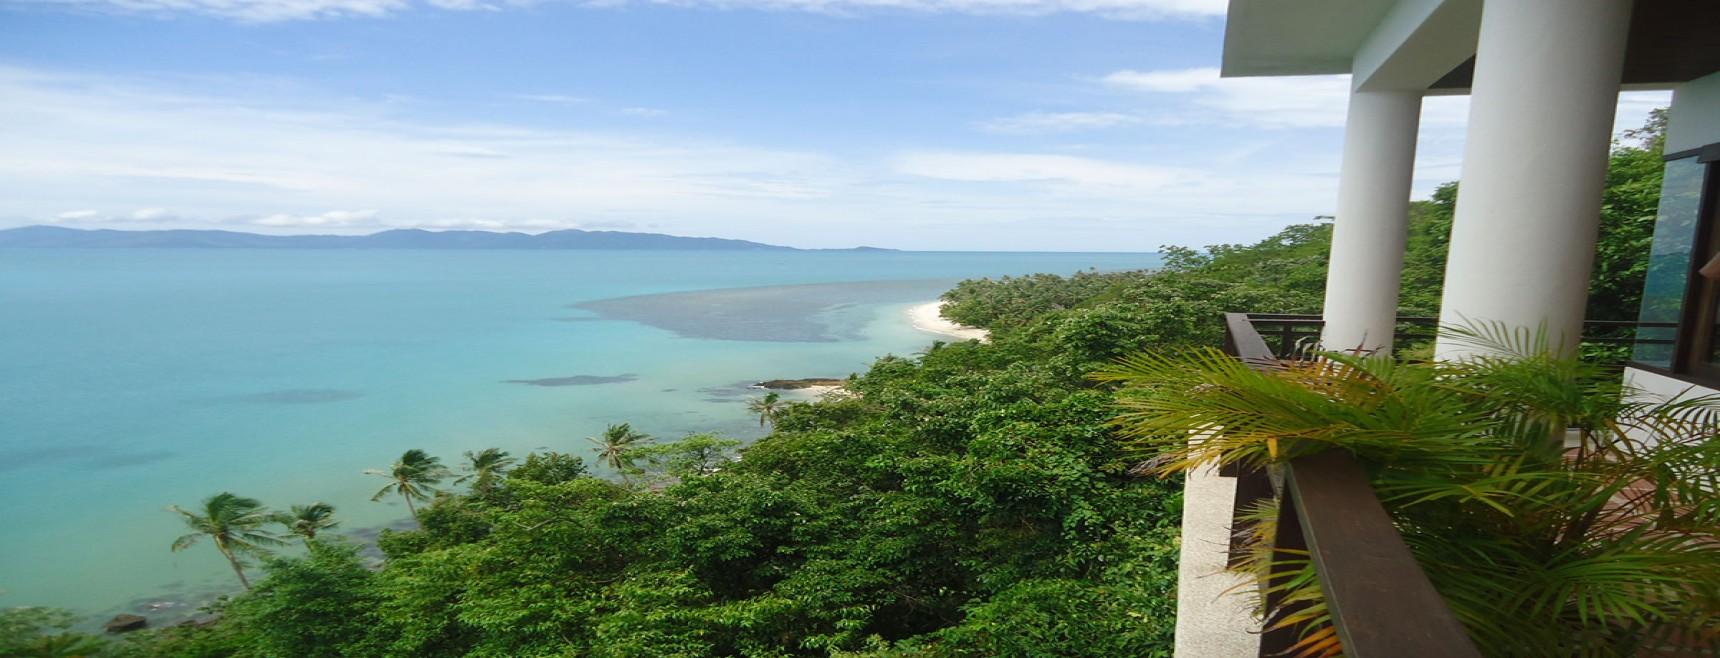 2 Rai For Sale Ban Tai Beach, Koh Samui With Existing Building (Thai-Real.com)